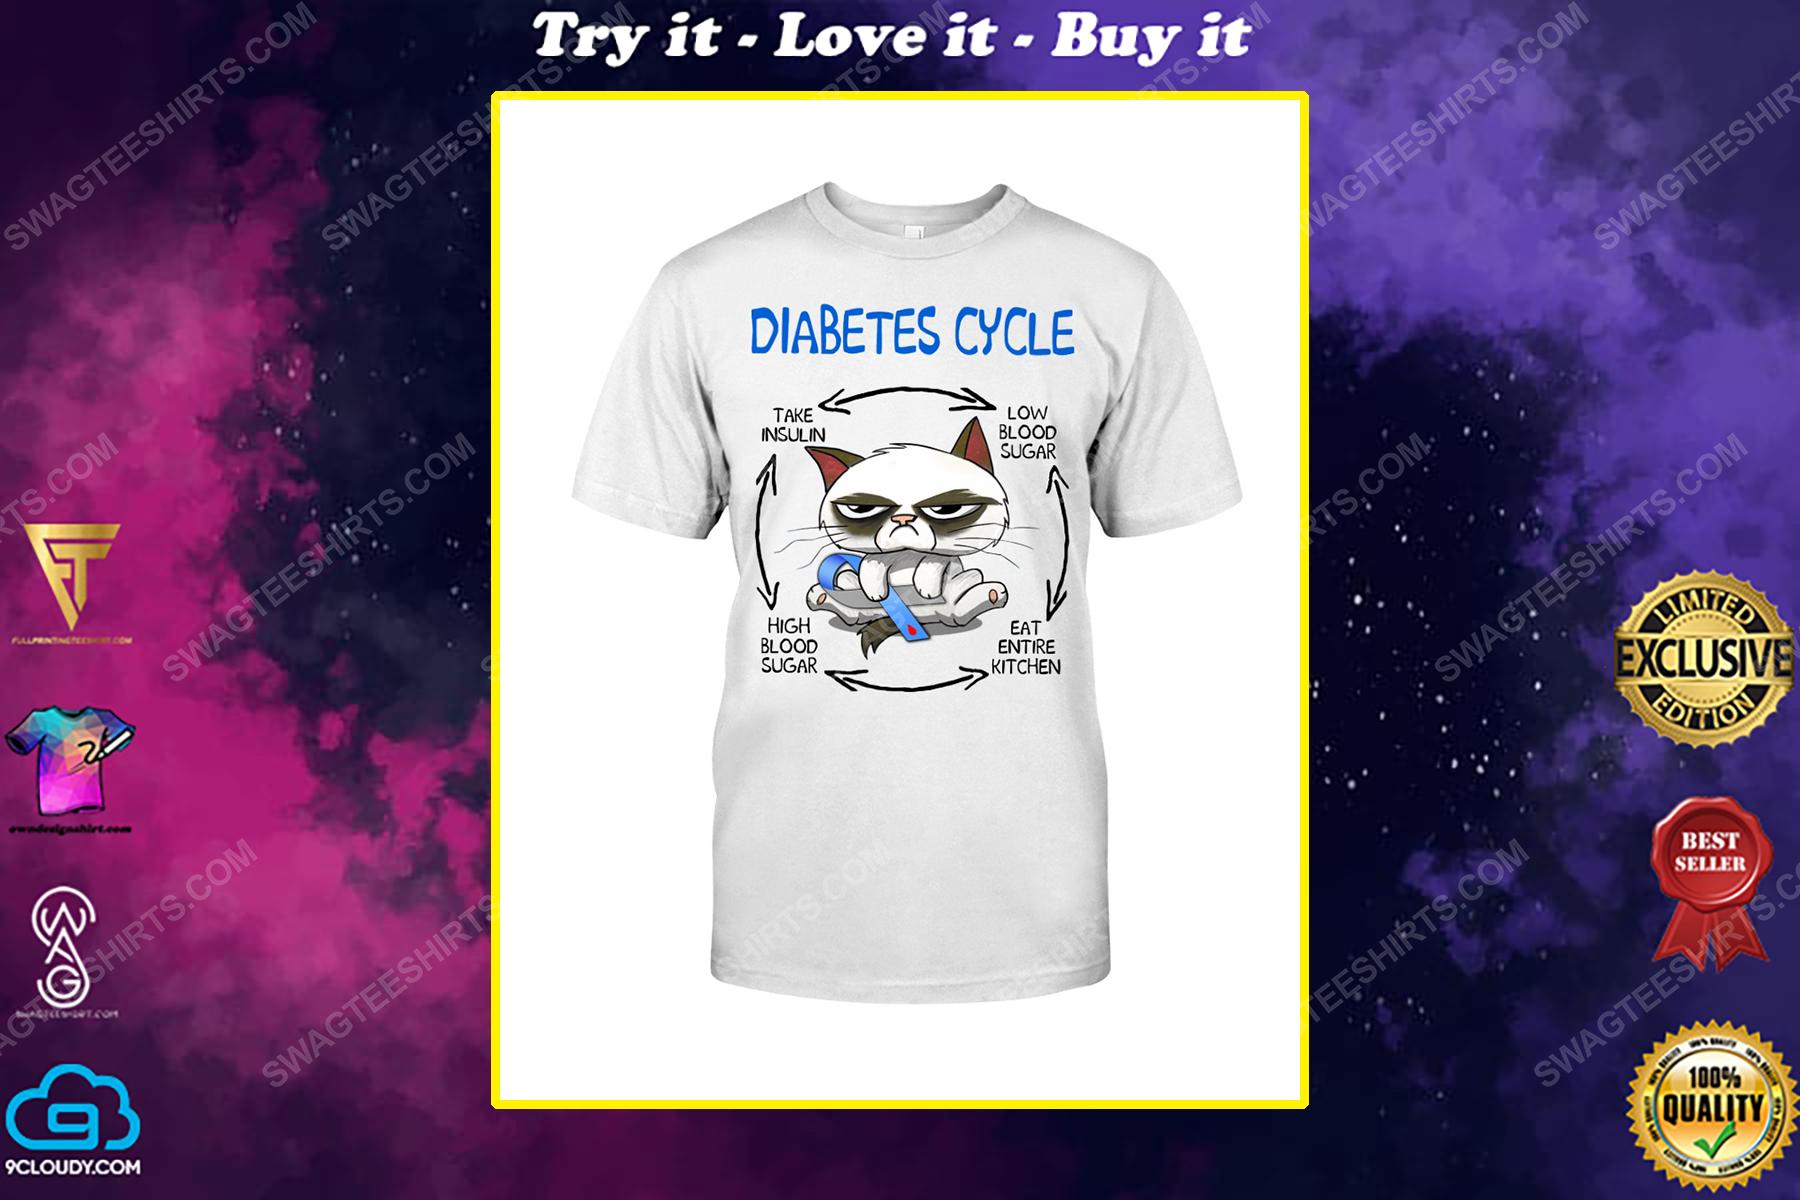 Cat diabetes cycle take insulin high blood sugar eat entire kitchen shirt